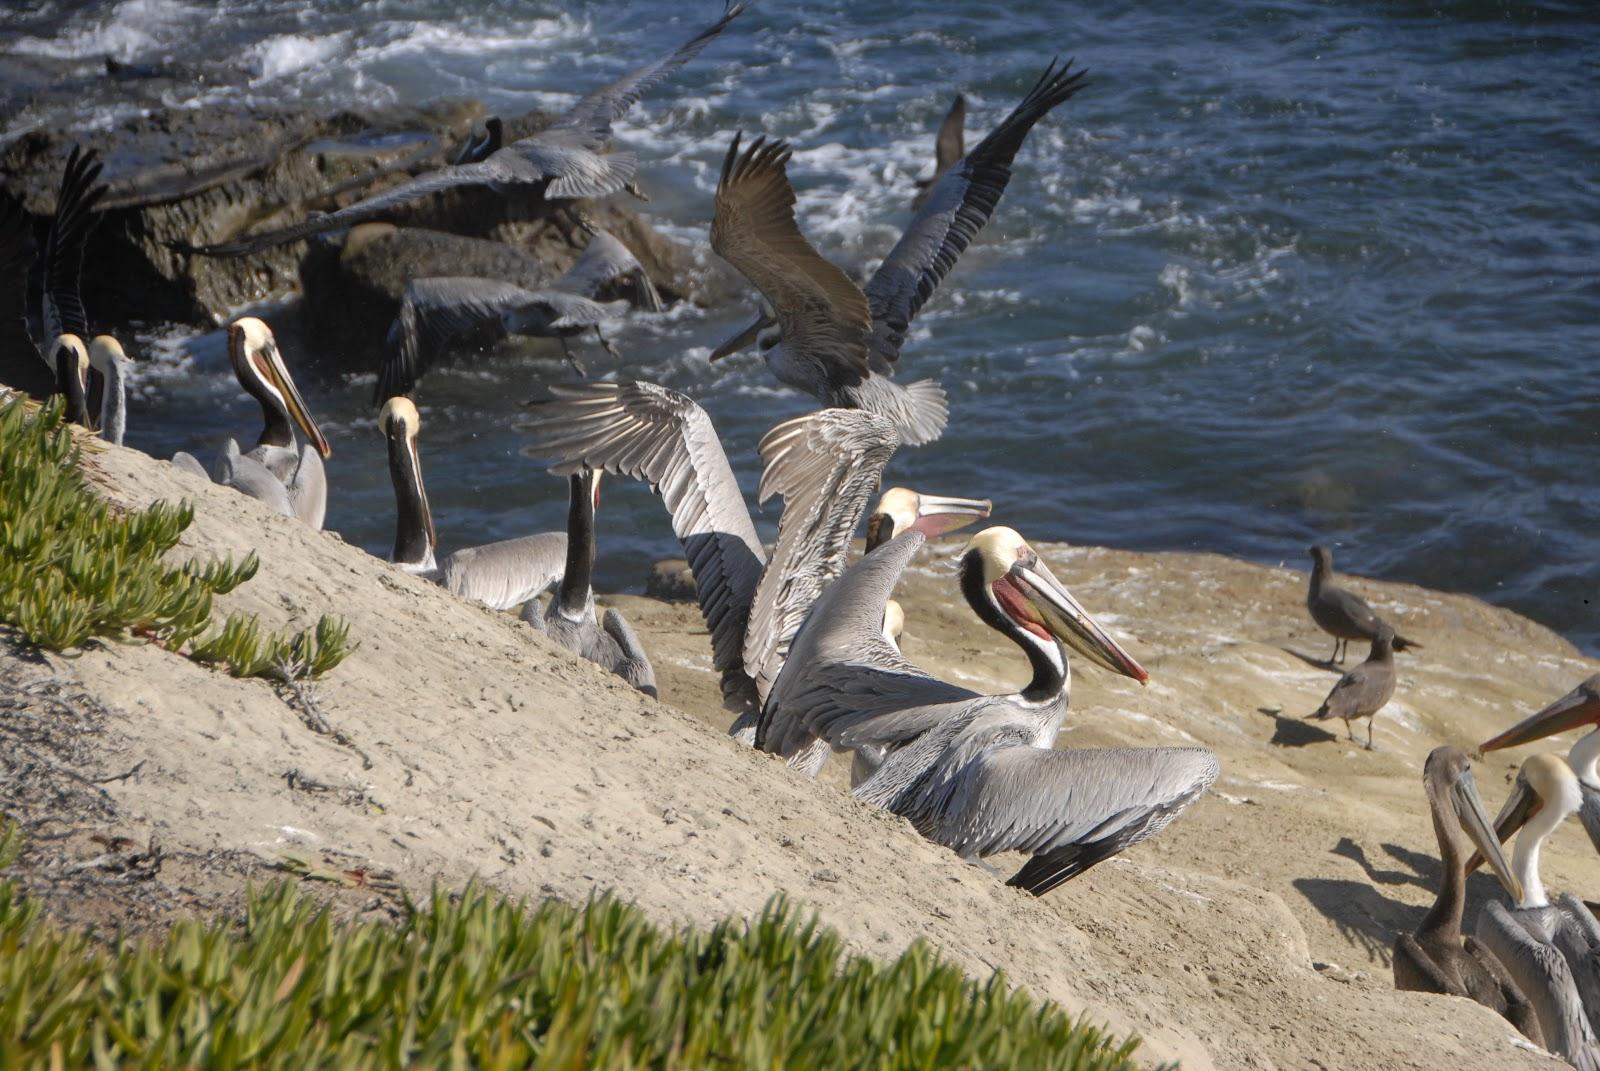 pelican's wing span